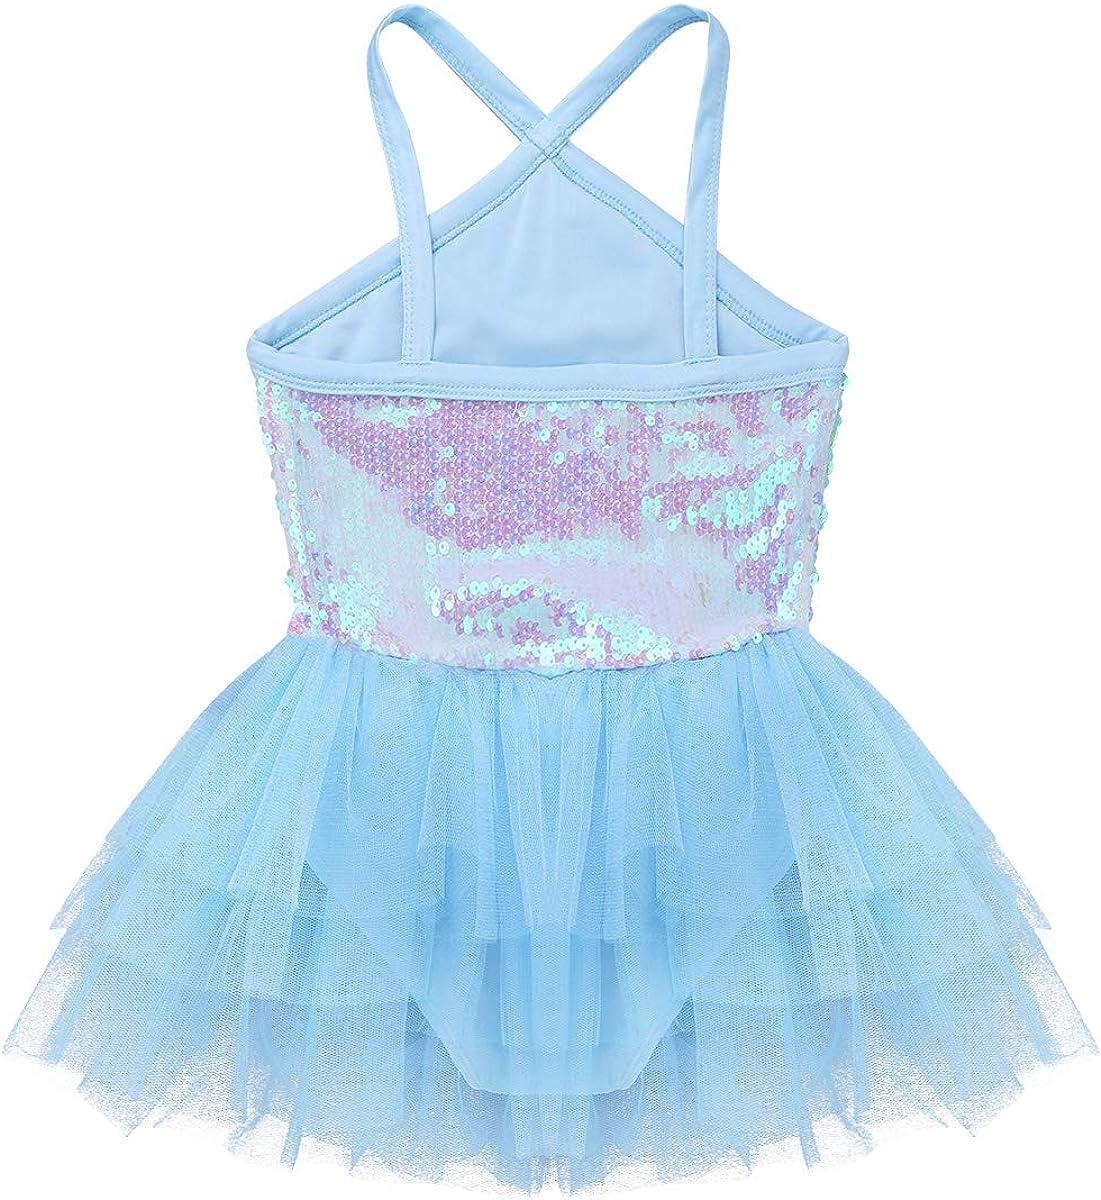 FEESHOW Girls Sequined Camisole Ballet Dance Tutu Dress Gymnastic Leotard Asymmetrical Skirt Fairy Costumes